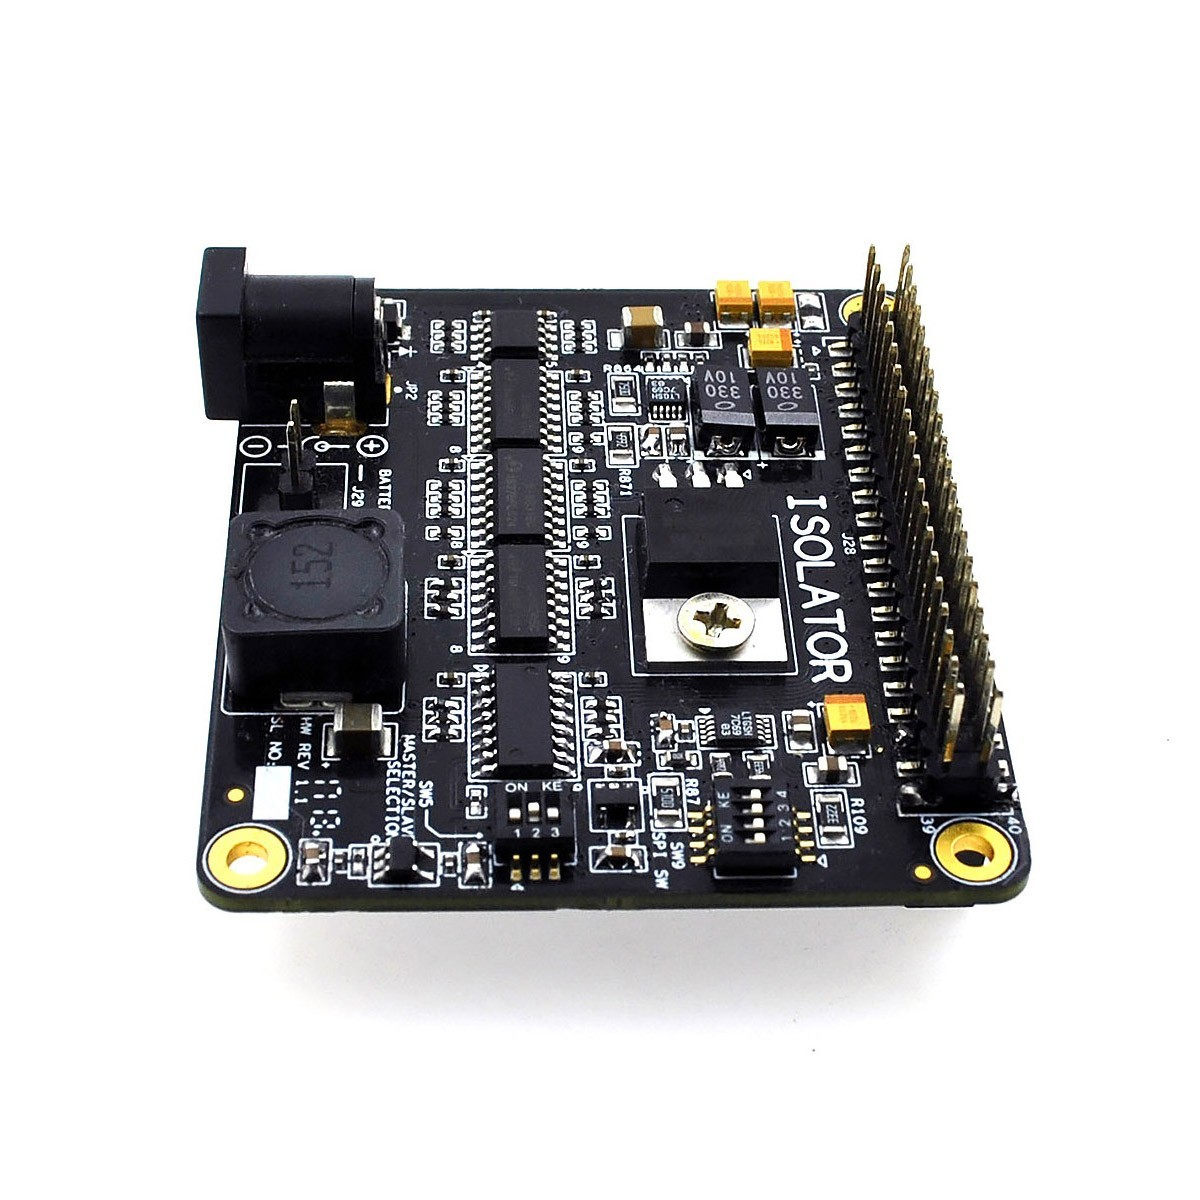 ALLO ISOLATOR V1 I2S GPIO Galvanic Isolator for Sparky / Raspberry PI